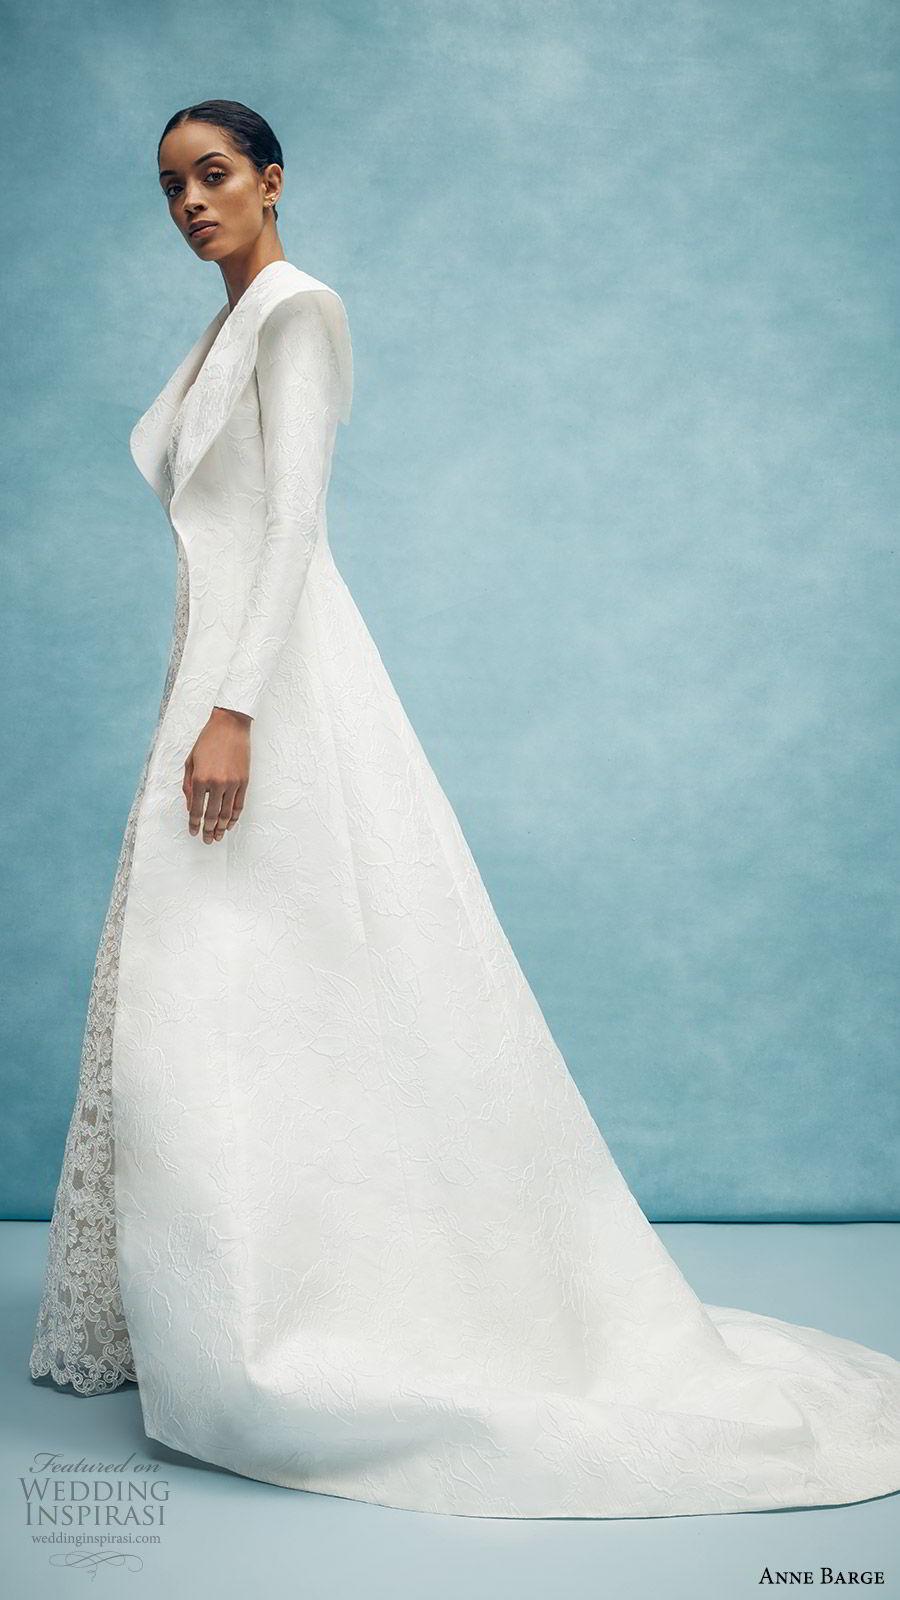 anne barge spring 2020 bridal strapless straight across fully embellished lace sheath wedding dress (3) long sleeve collar jacket elegant chapel train sv